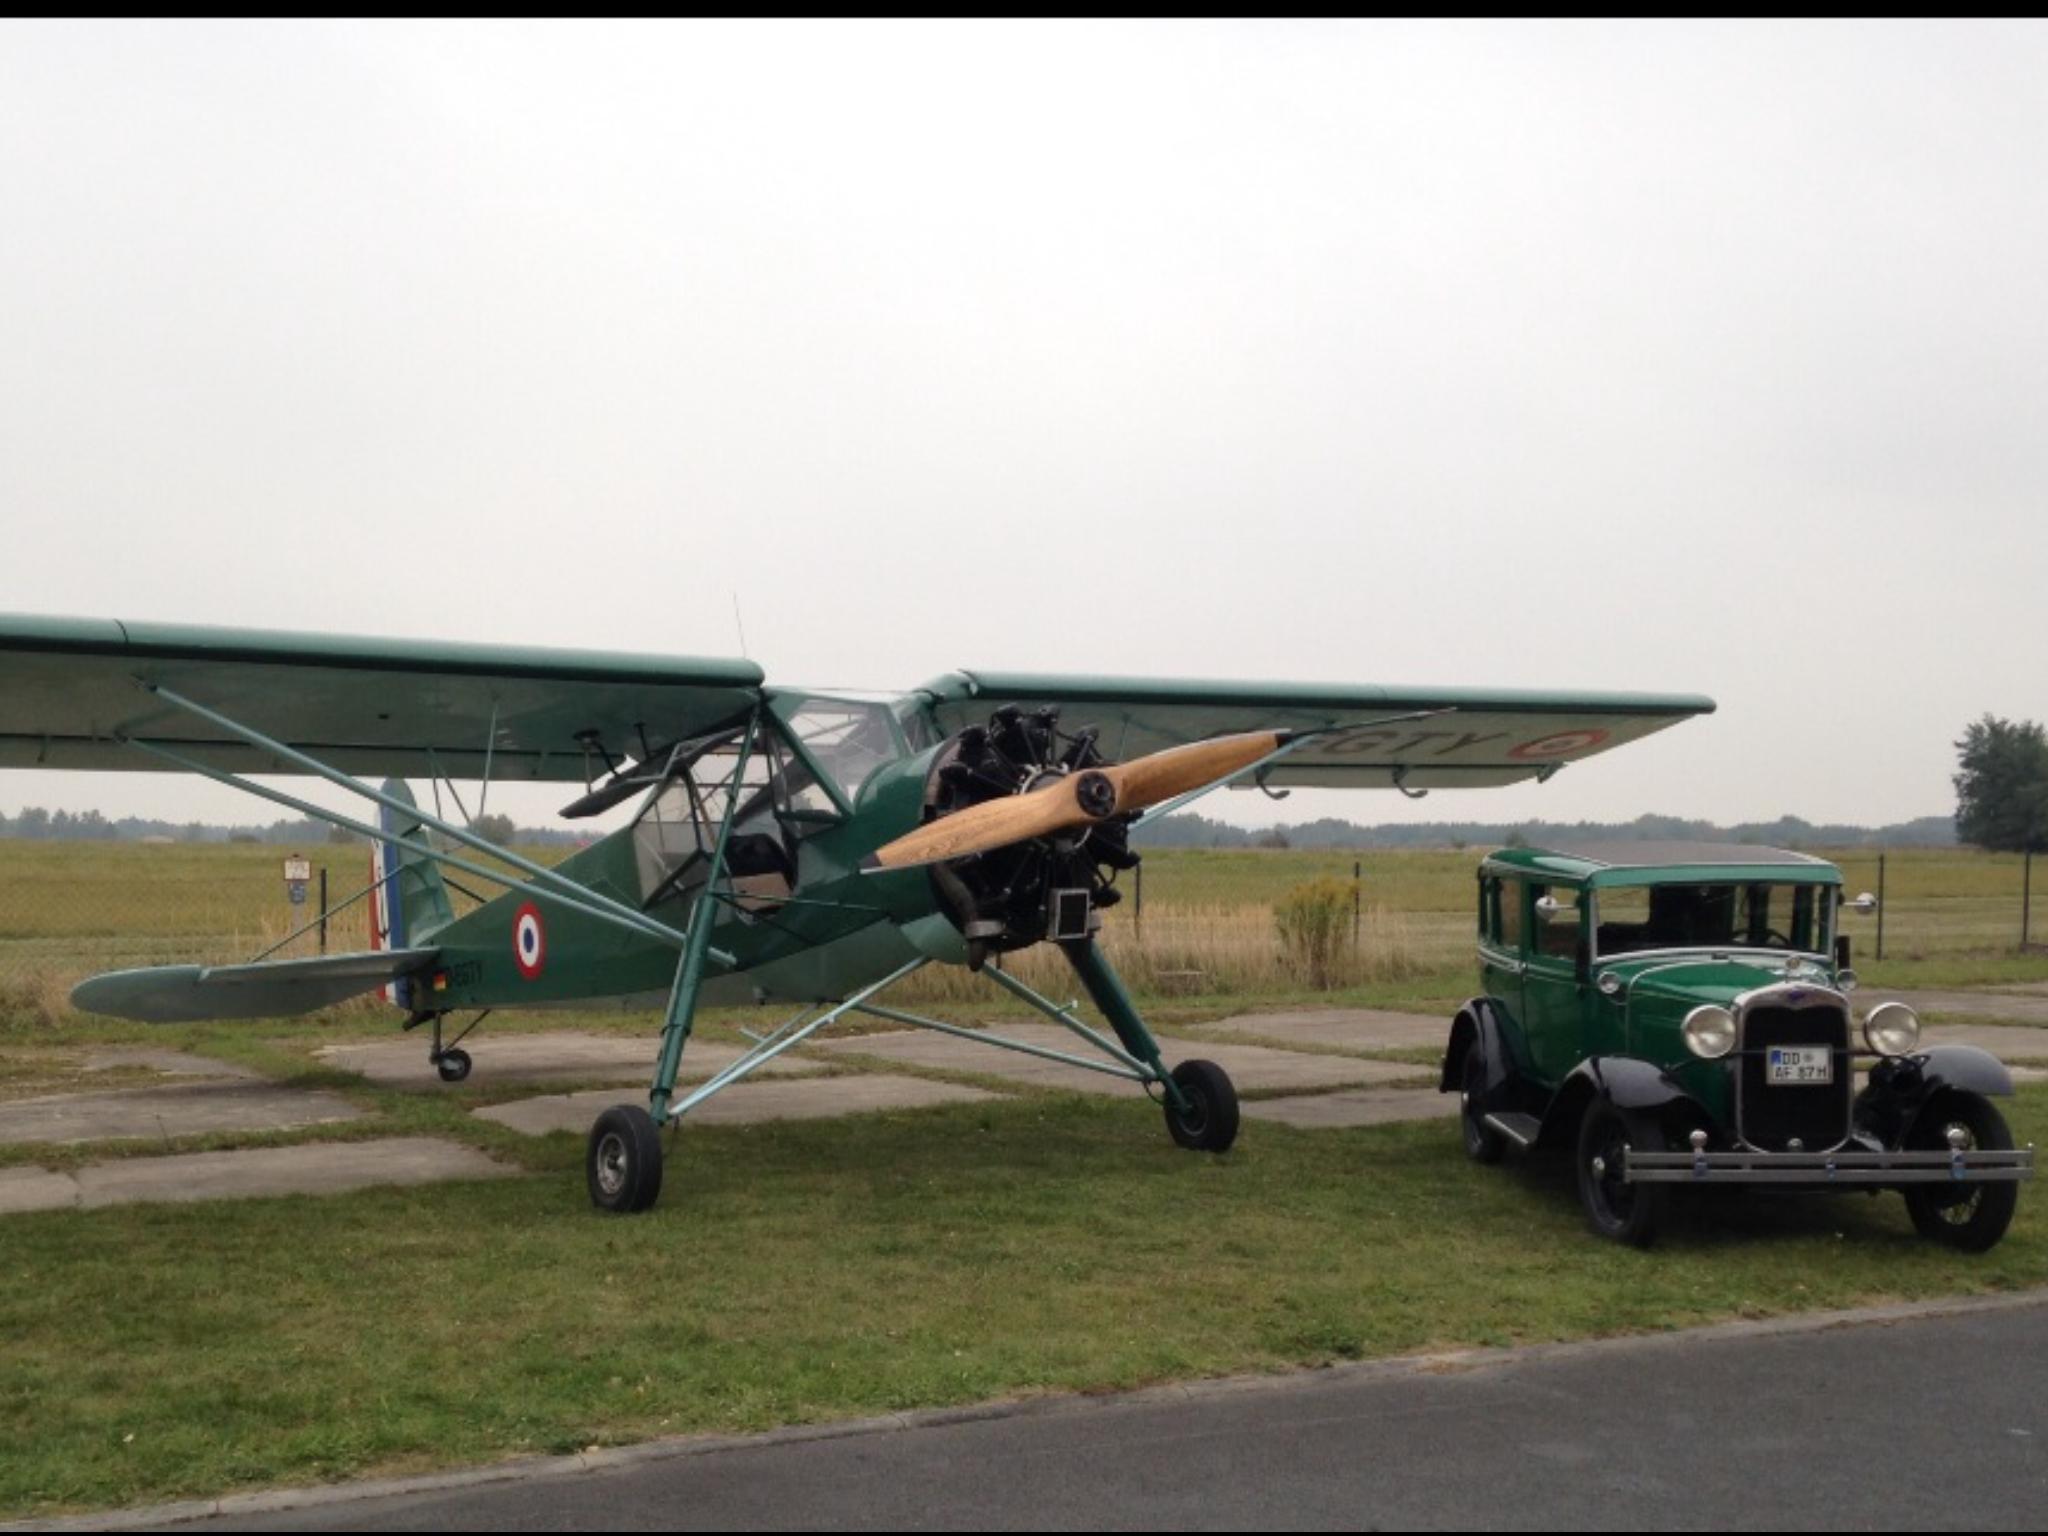 Fliegendes Museum